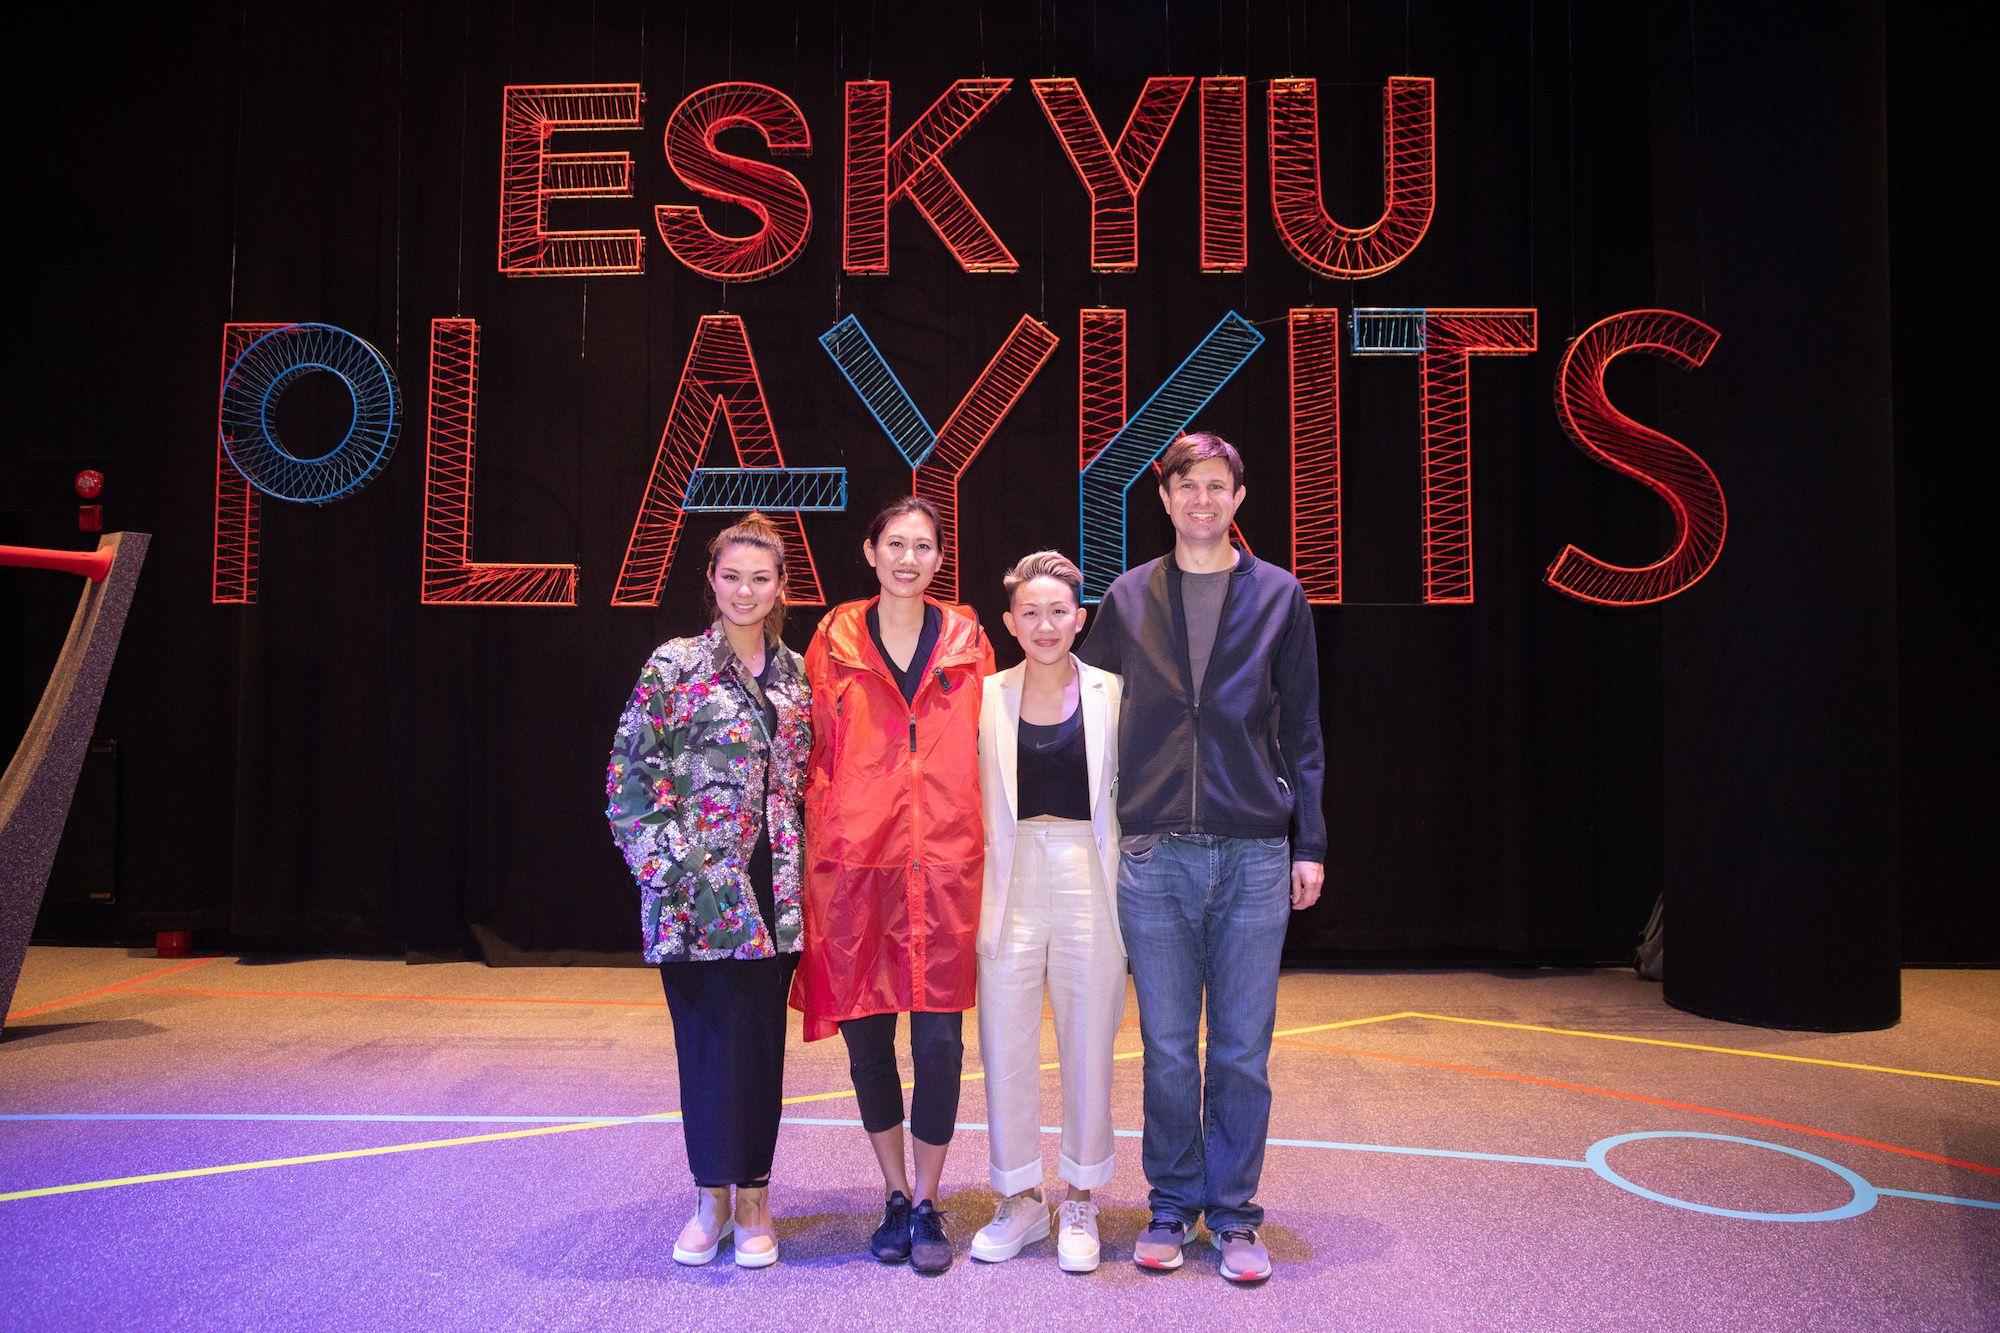 Samantha Wong, Marisa Yiu, May Chow, Eric Schuldenfrei